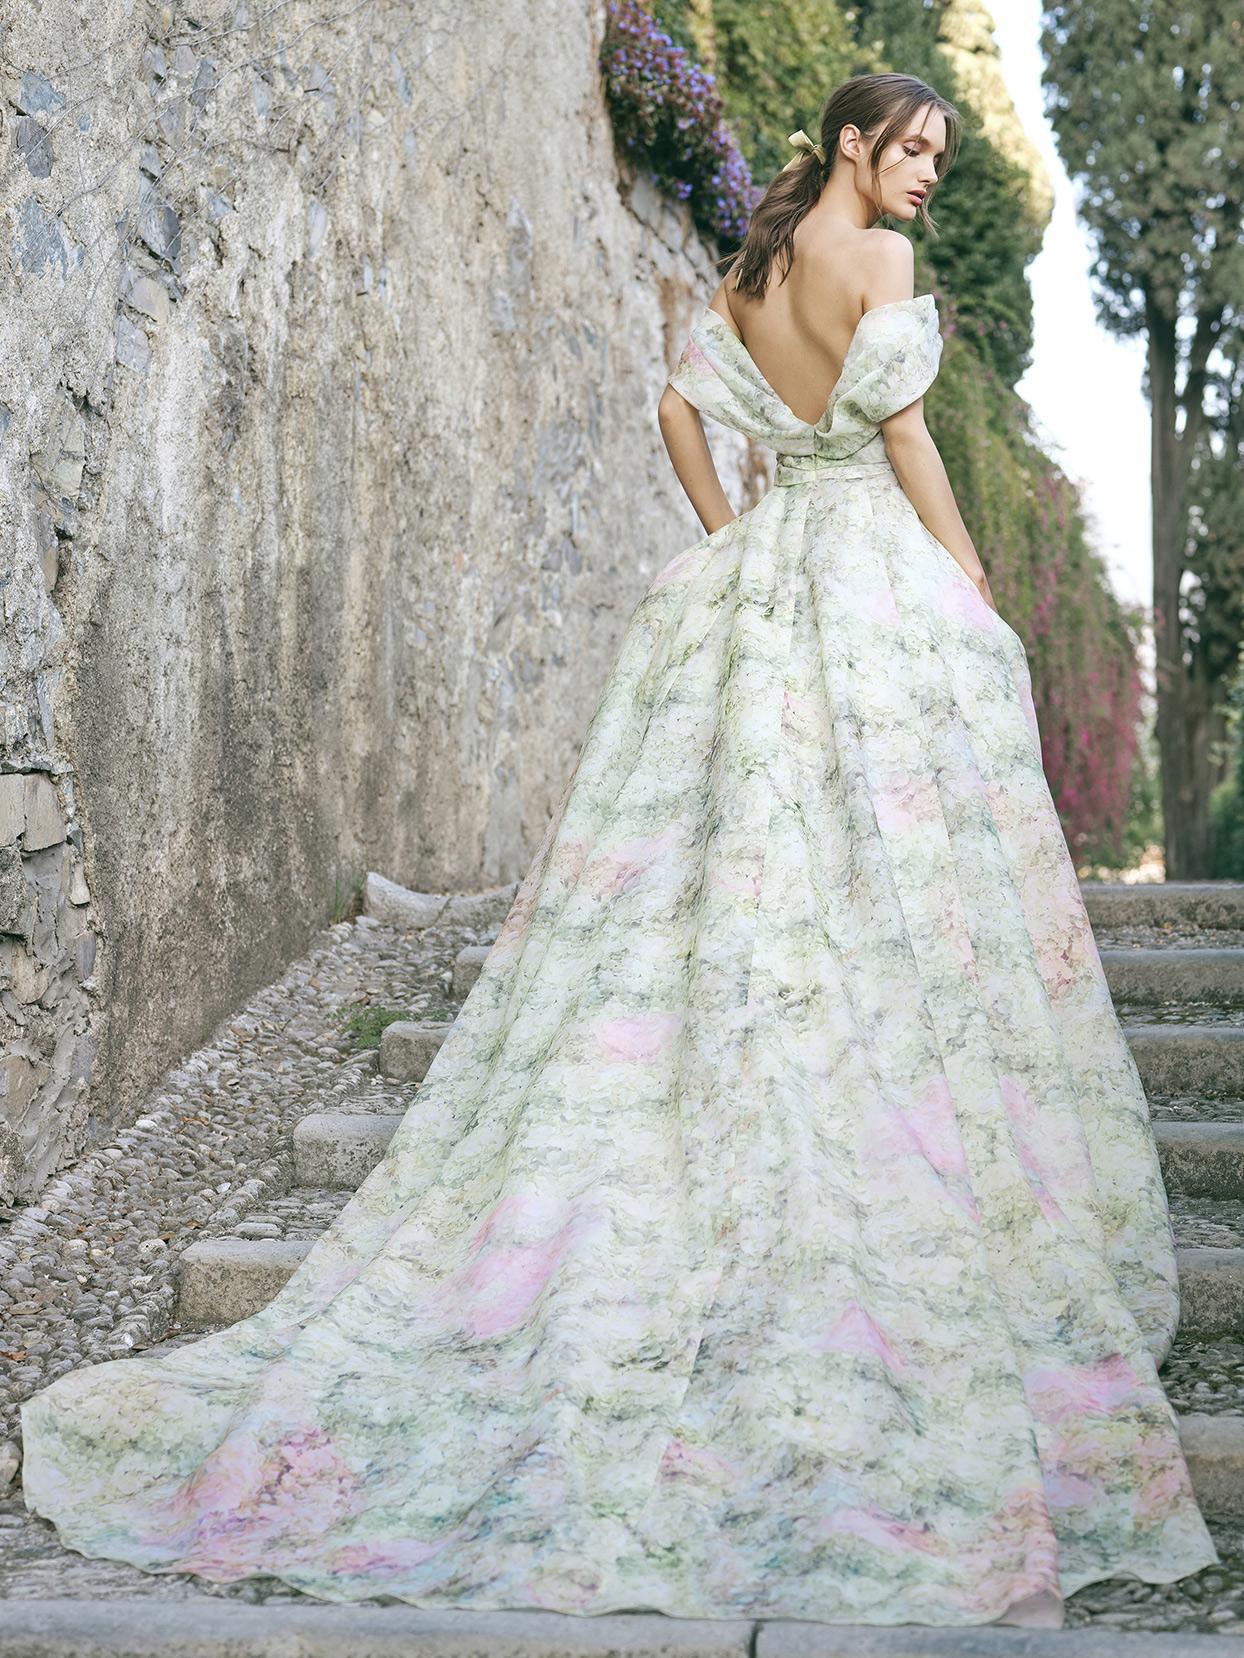 monique lhuillier off the shoulder ball gown wedding dress fall 2020